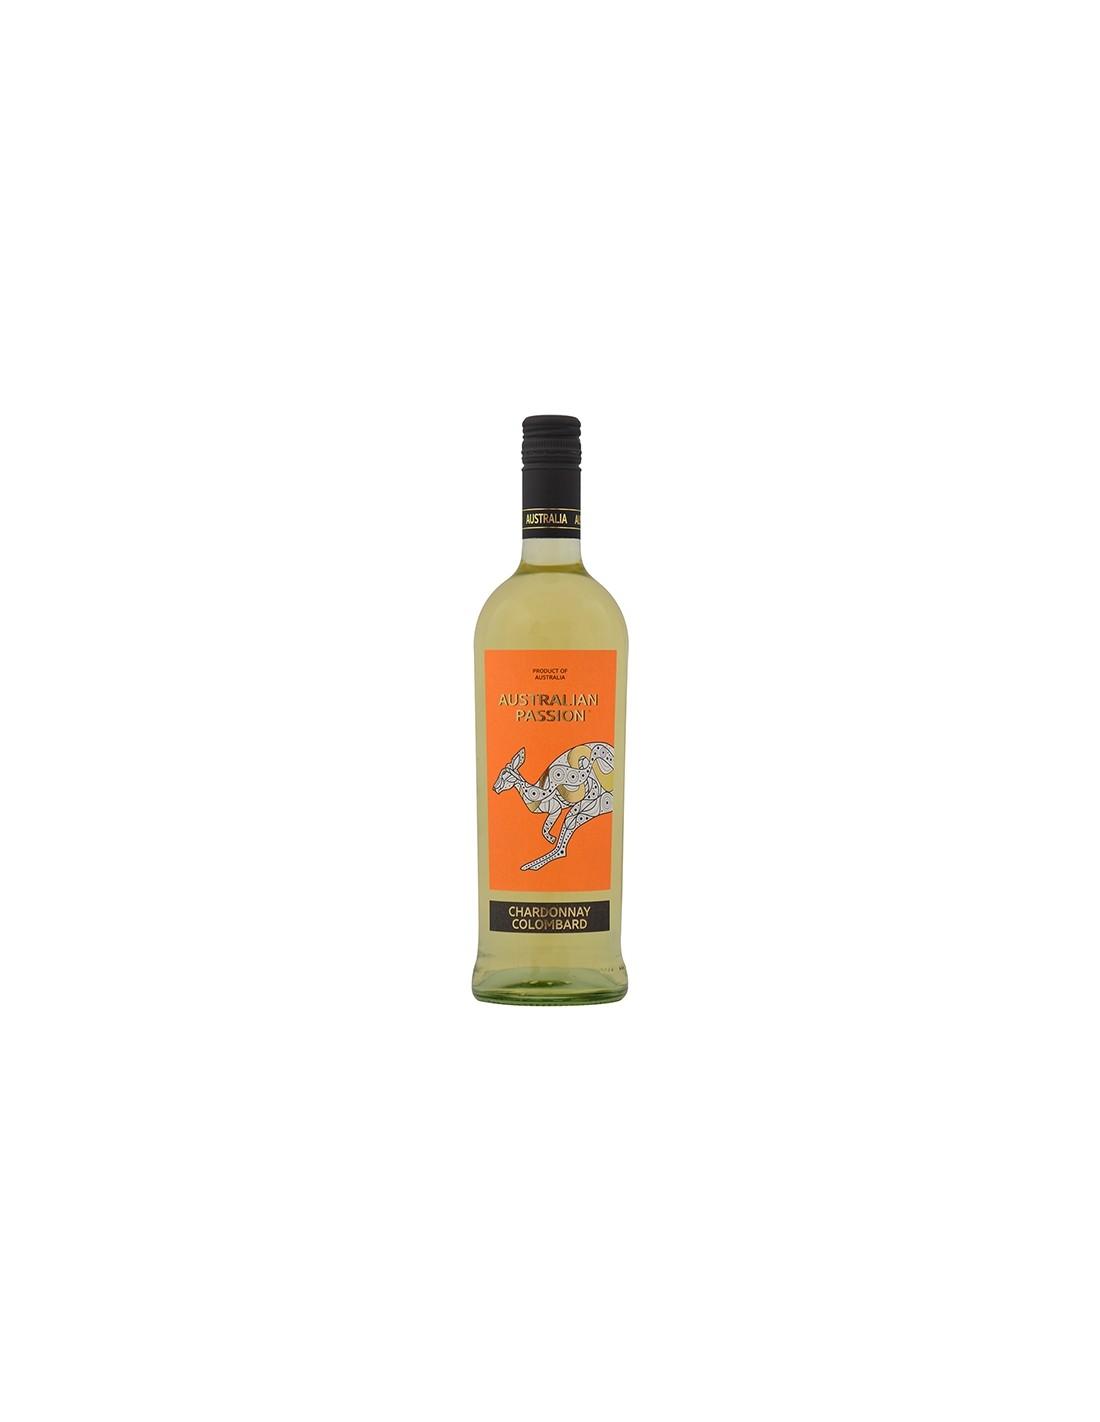 Vin alb sec, Chardonnay Colombard, Australian Passion, 12.5% alc., 0.75L, Australia